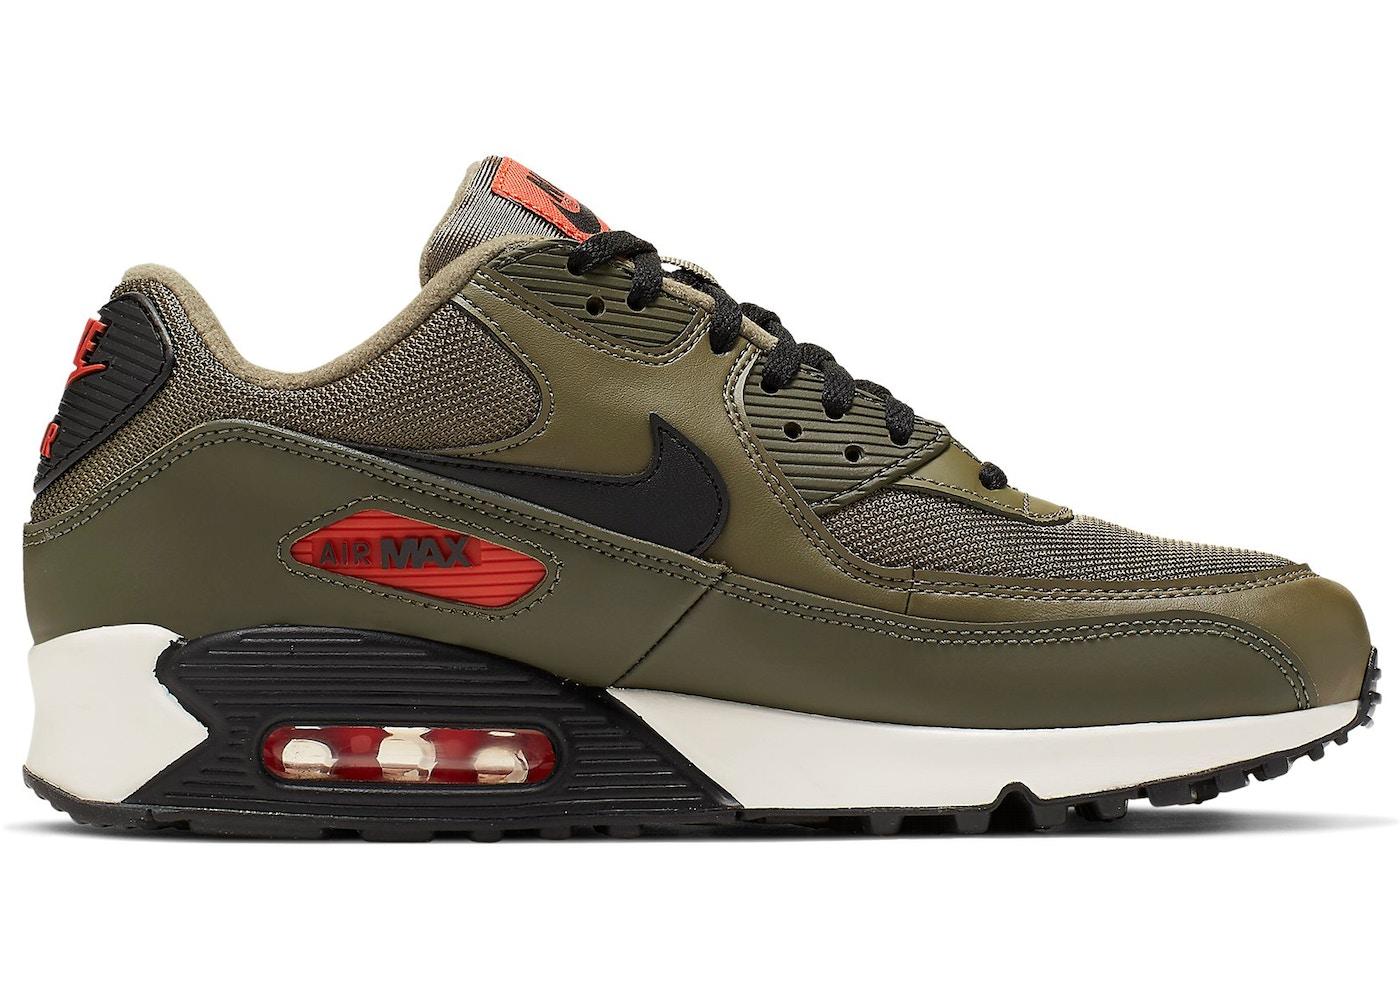 874d34c0b937 Buy Nike Air Max 90 Shoes   Deadstock Sneakers